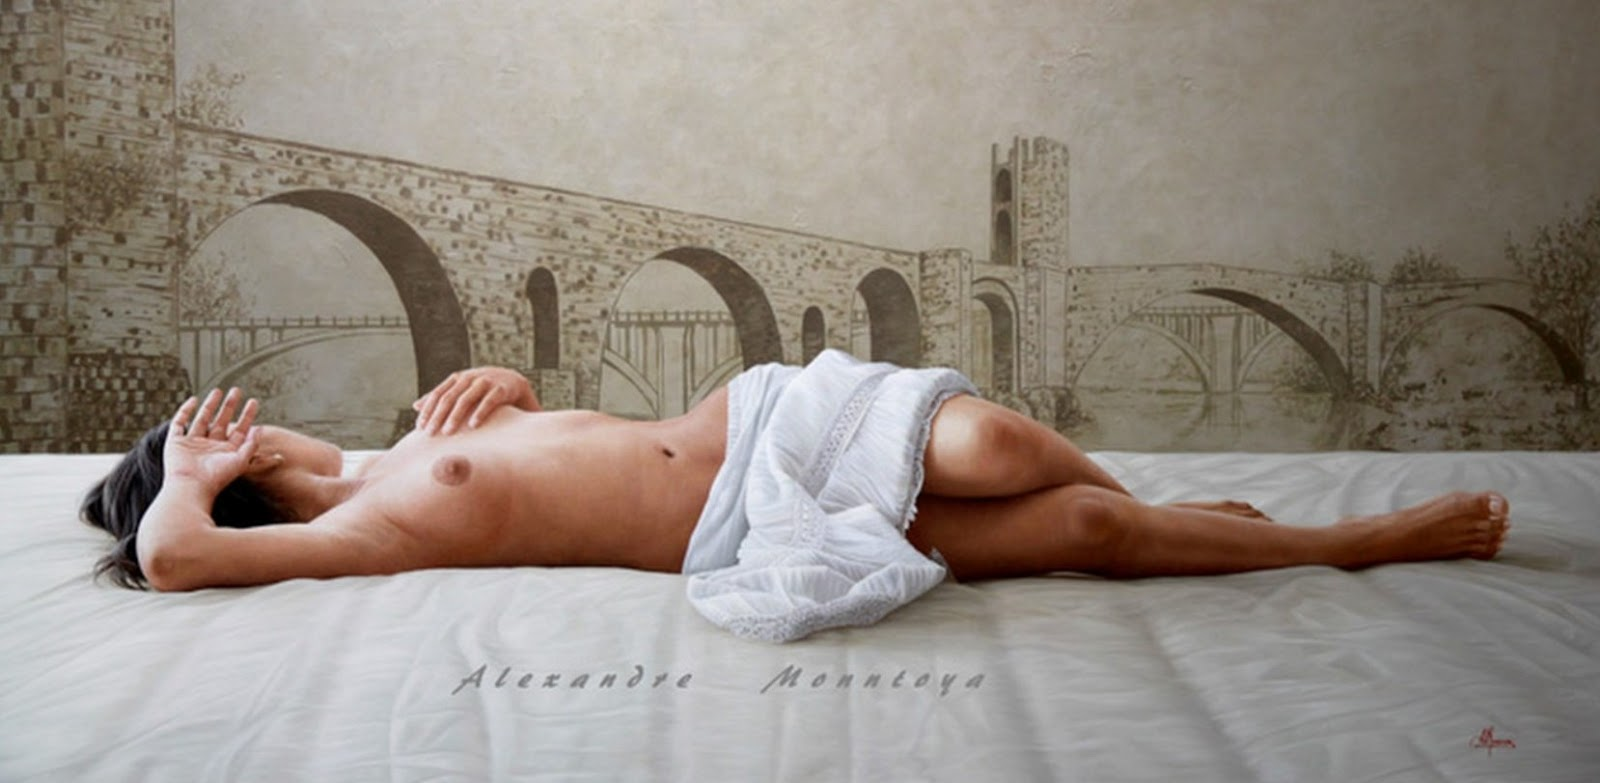 Serie Desnudos Femeninos Al Leo